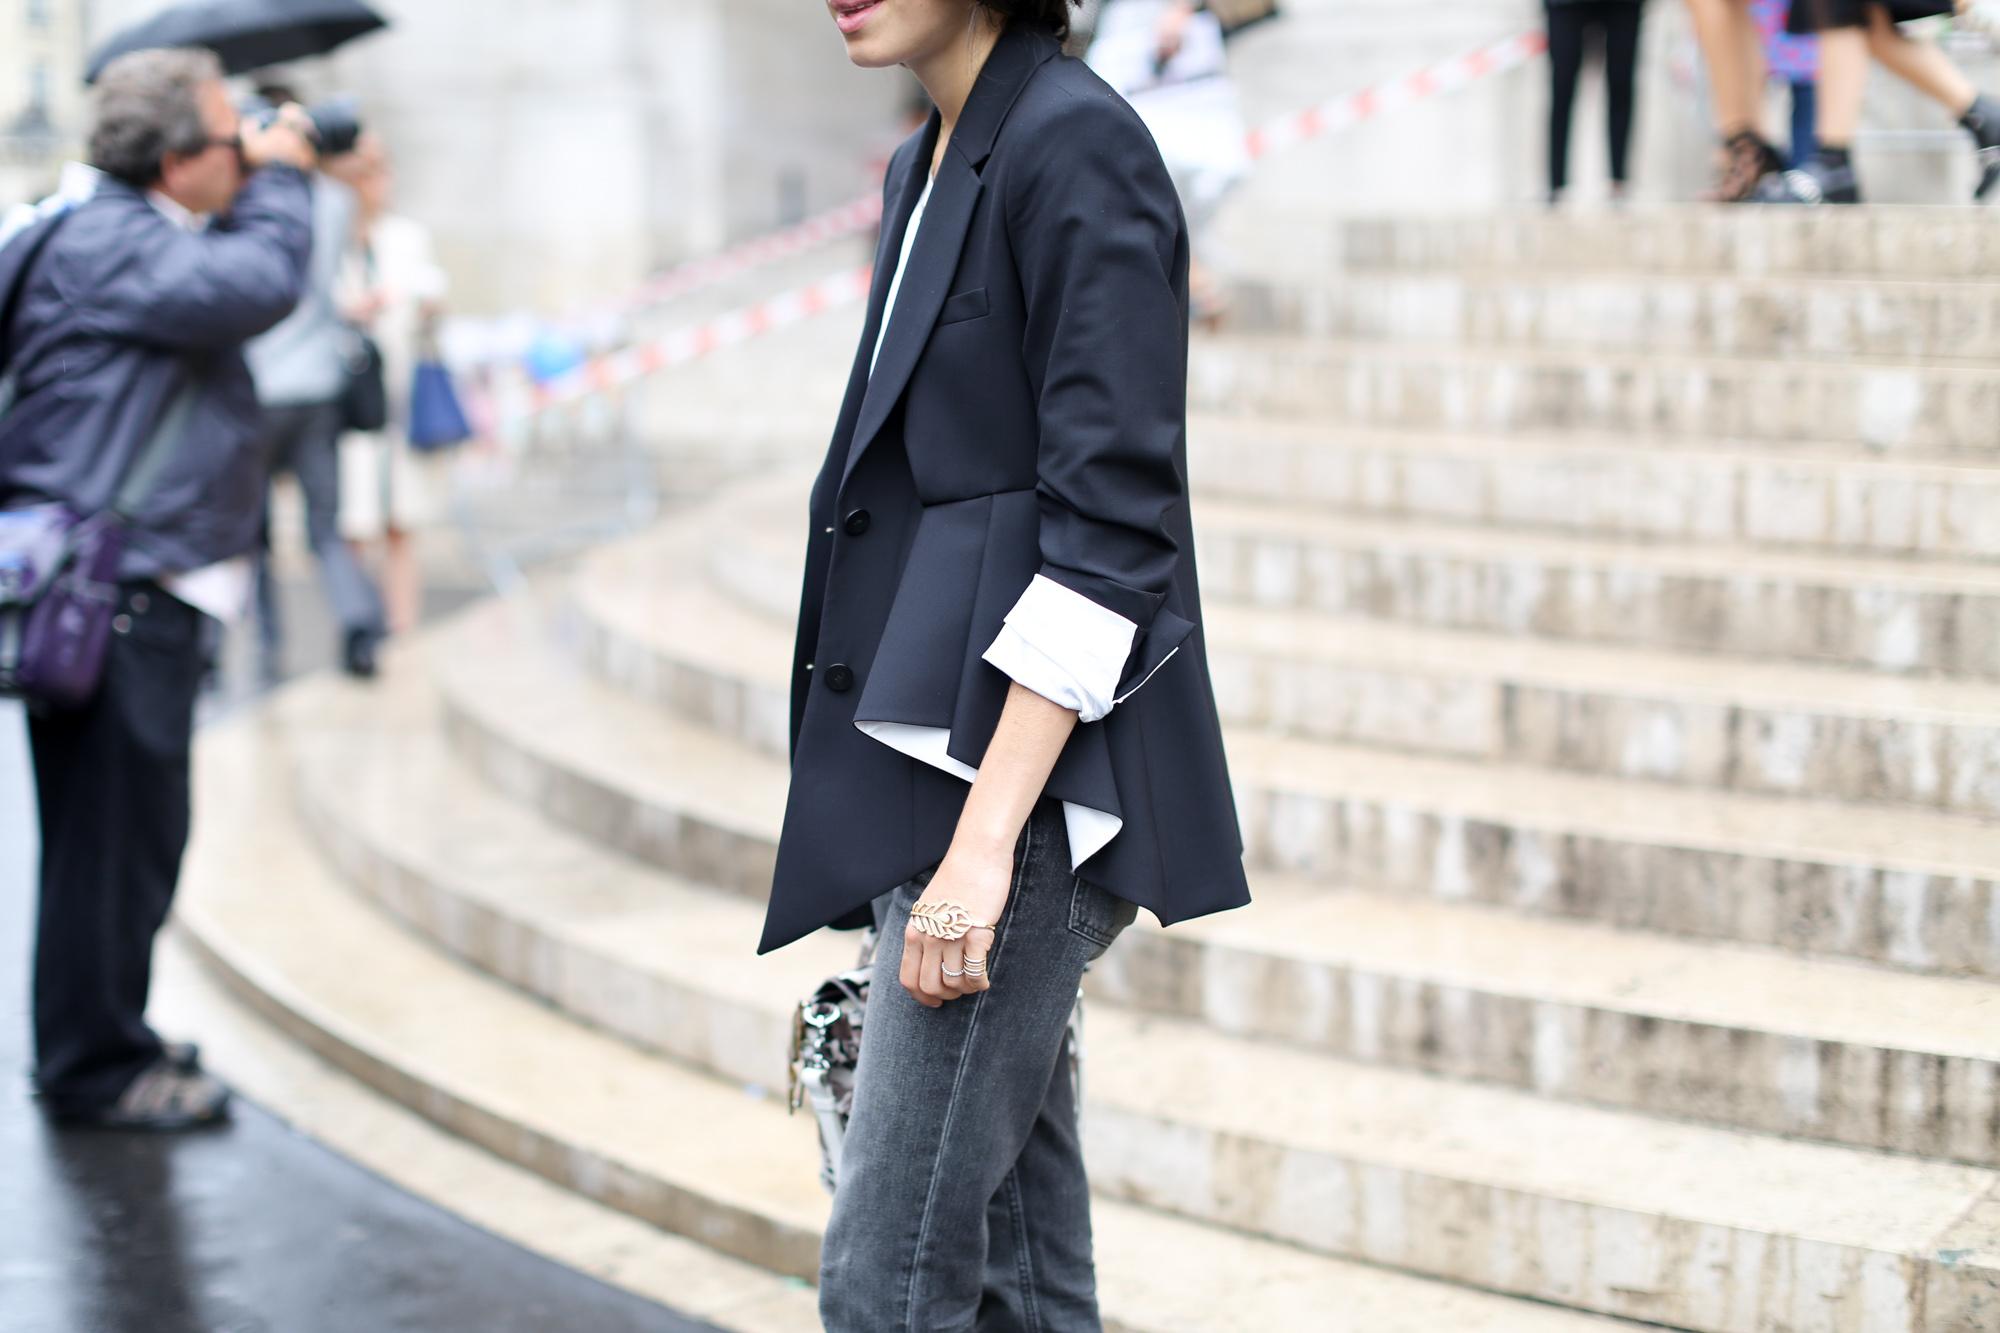 Clochet-streetstyle-paris-fashion-week-leandra-medine